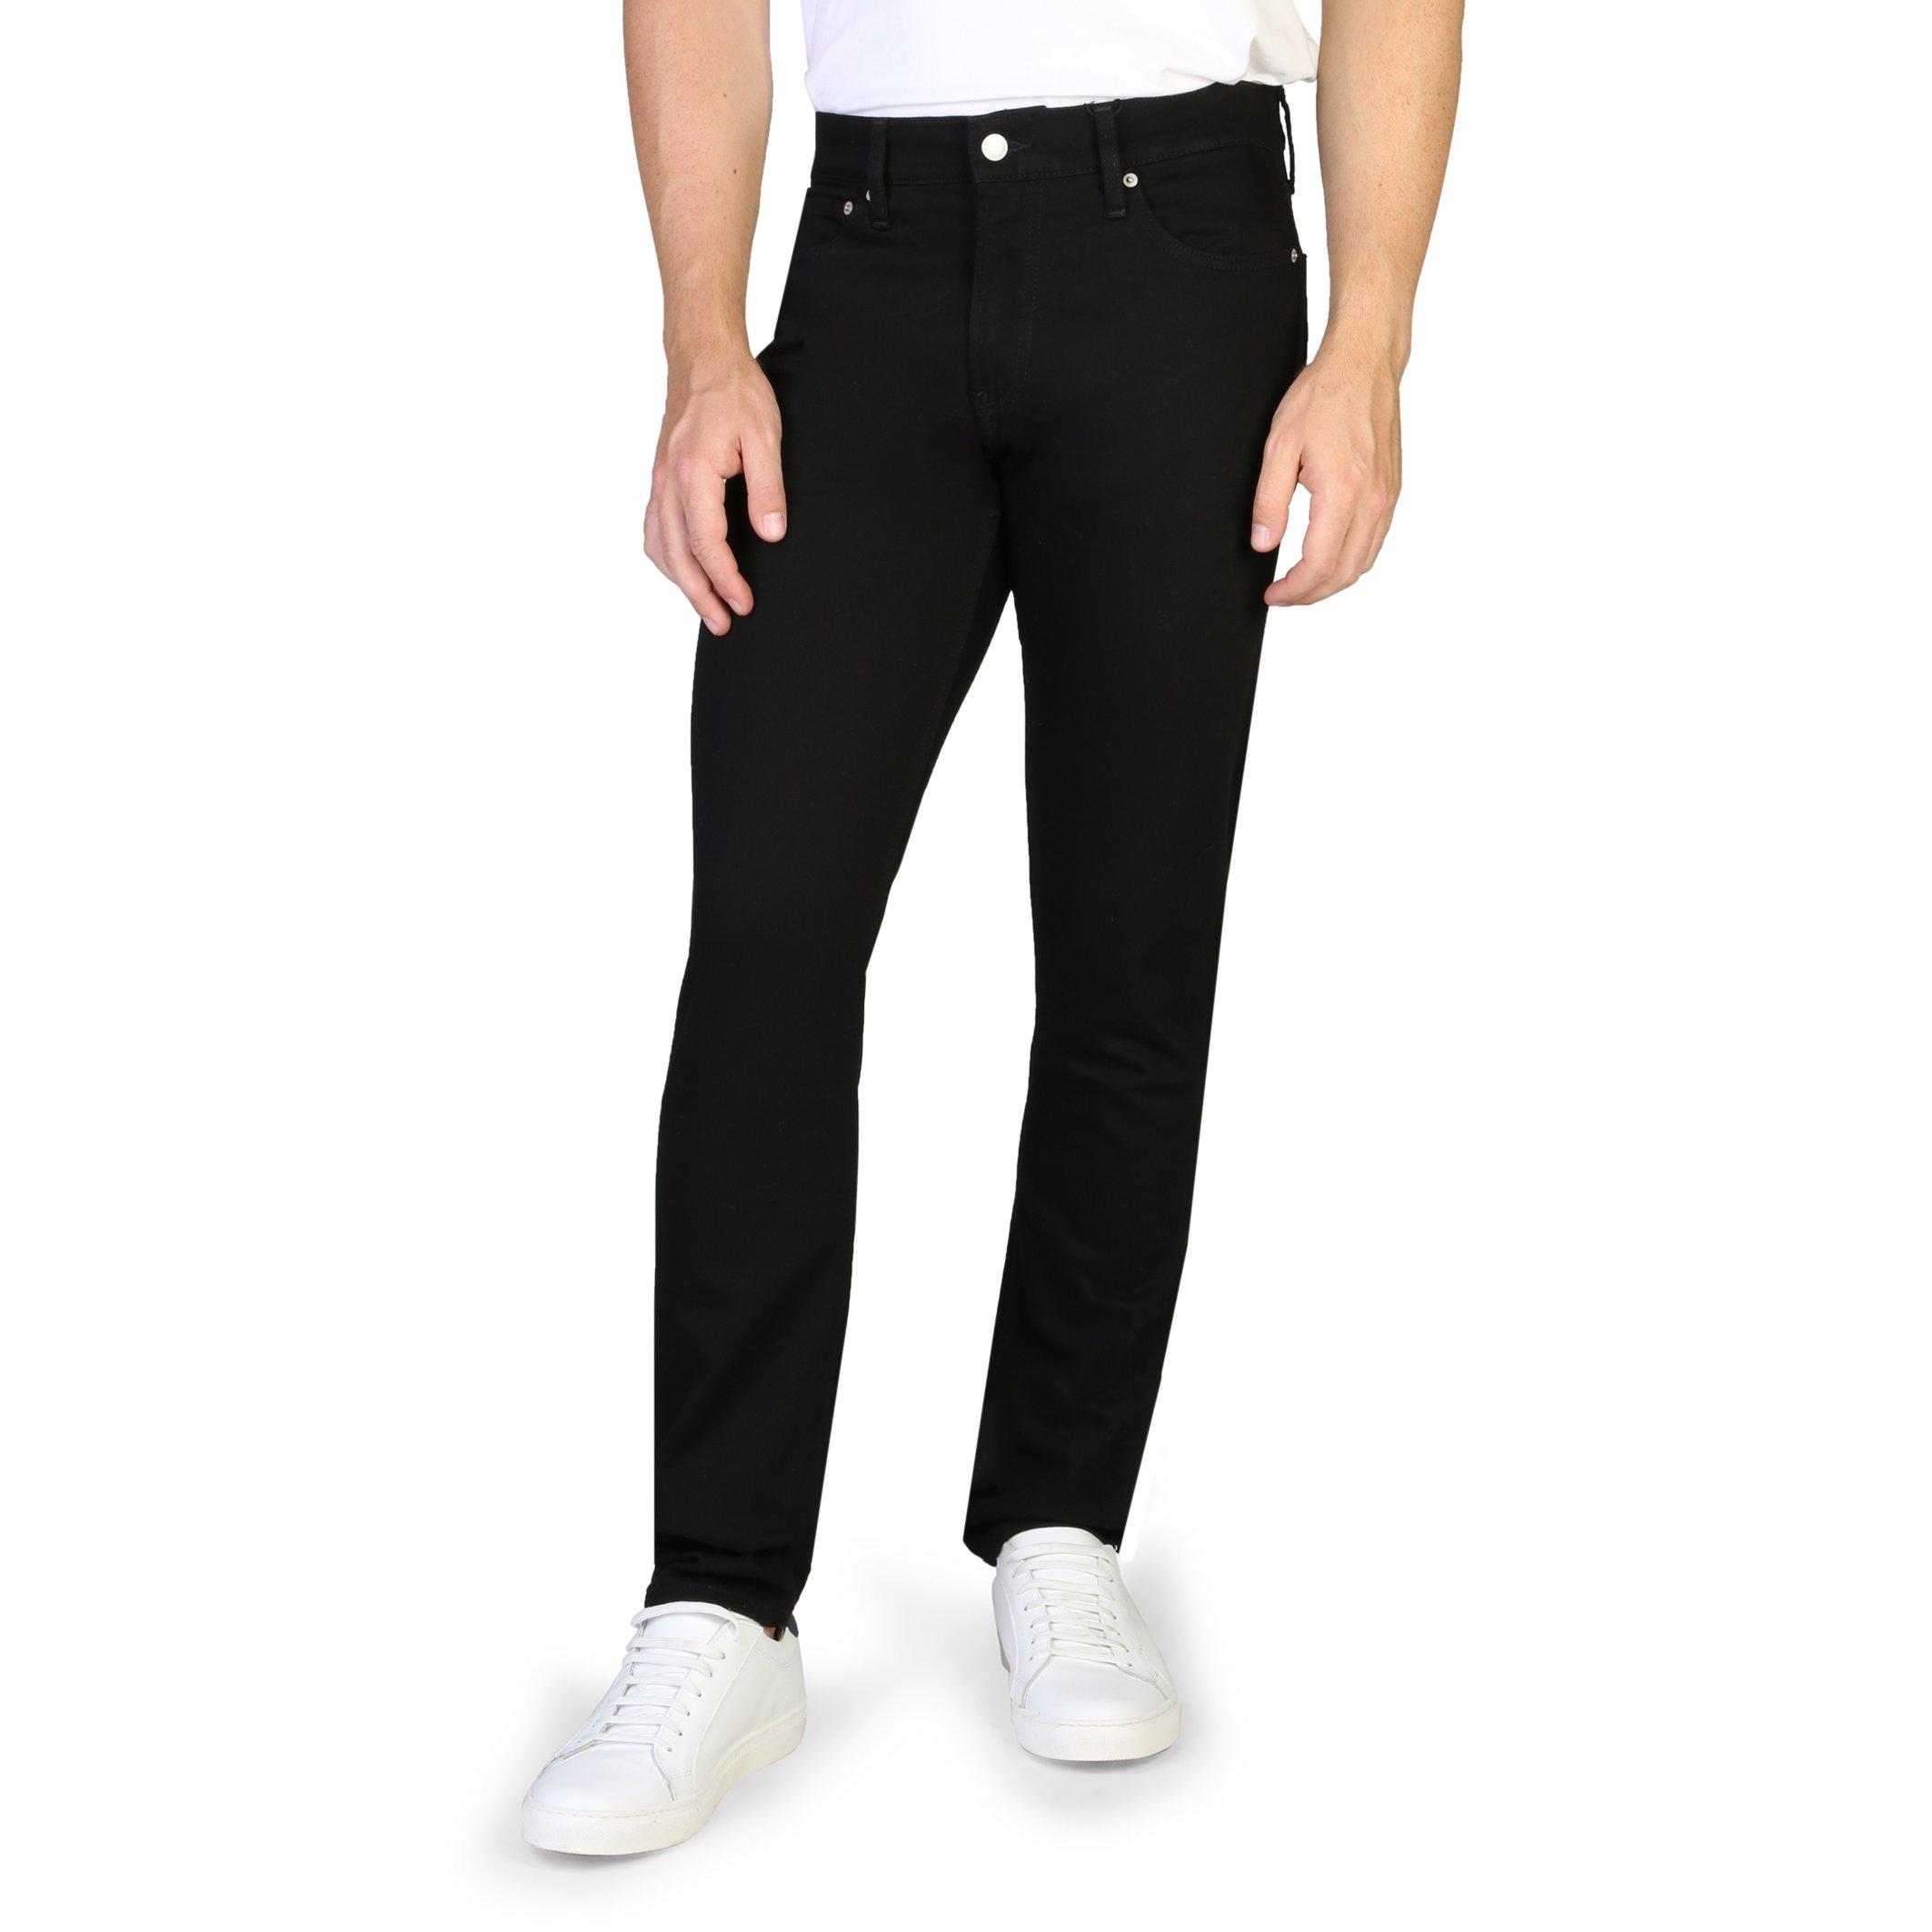 Calvin Klein Men's Jeans Black 350067 - black-1 28